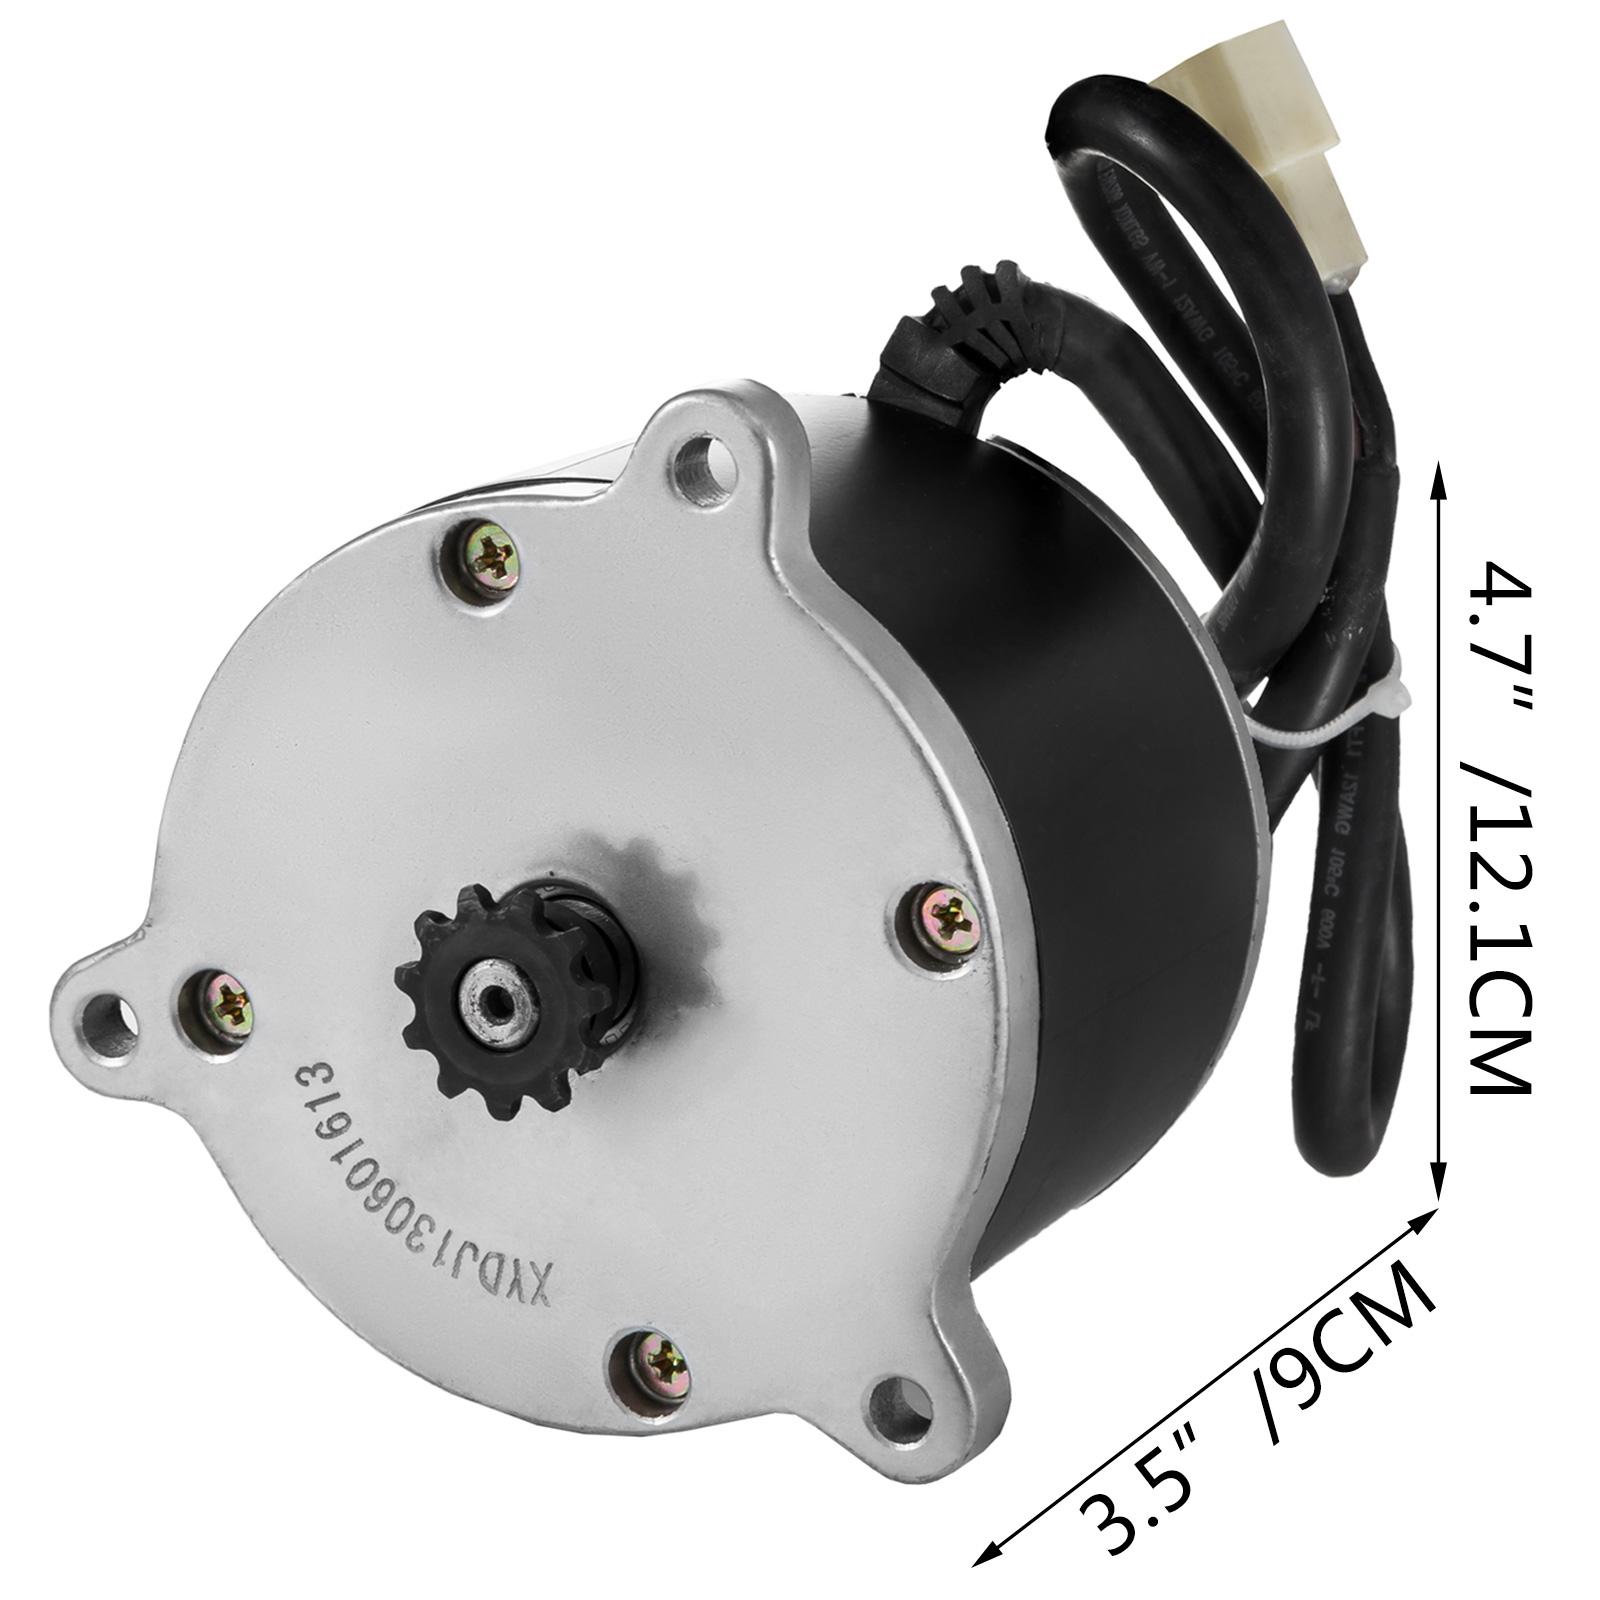 DC-electric-motor-12-60V-150W-2KW-for-scooter-bike-go-kart-minibike-e-ATV thumbnail 44